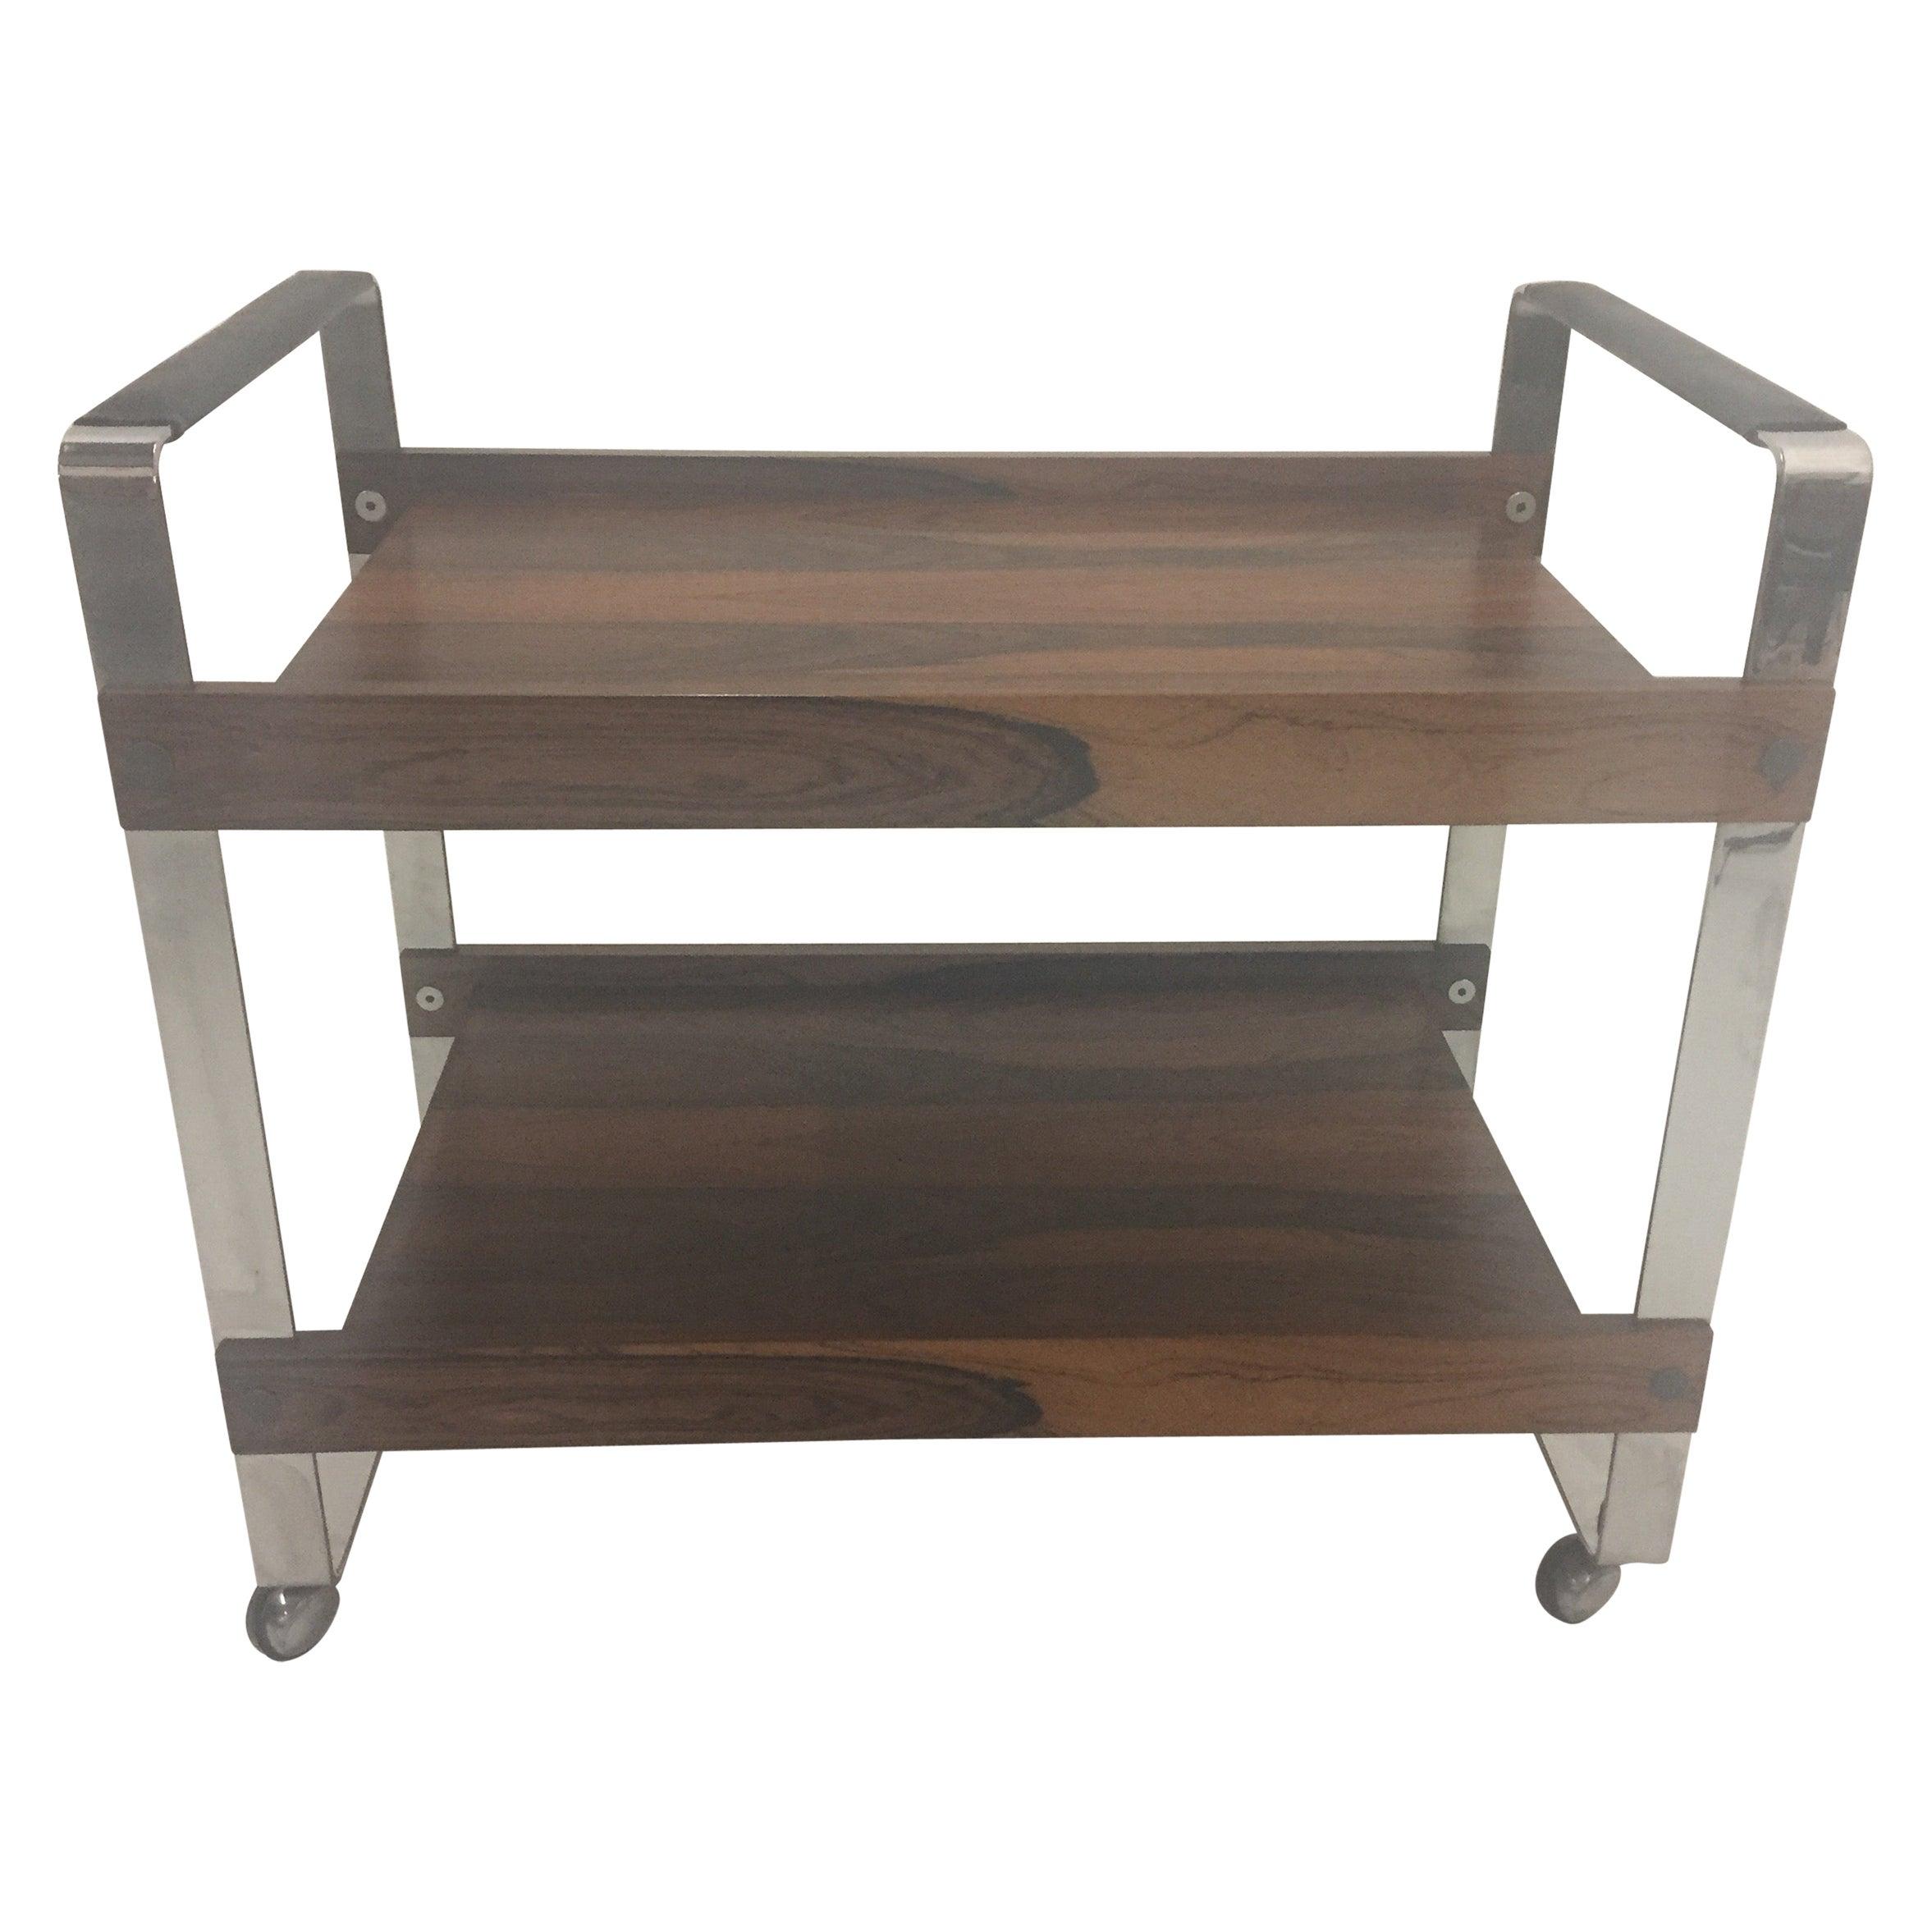 Sleek Rosewood and Chrome Mid-Century Modern Bar Cart